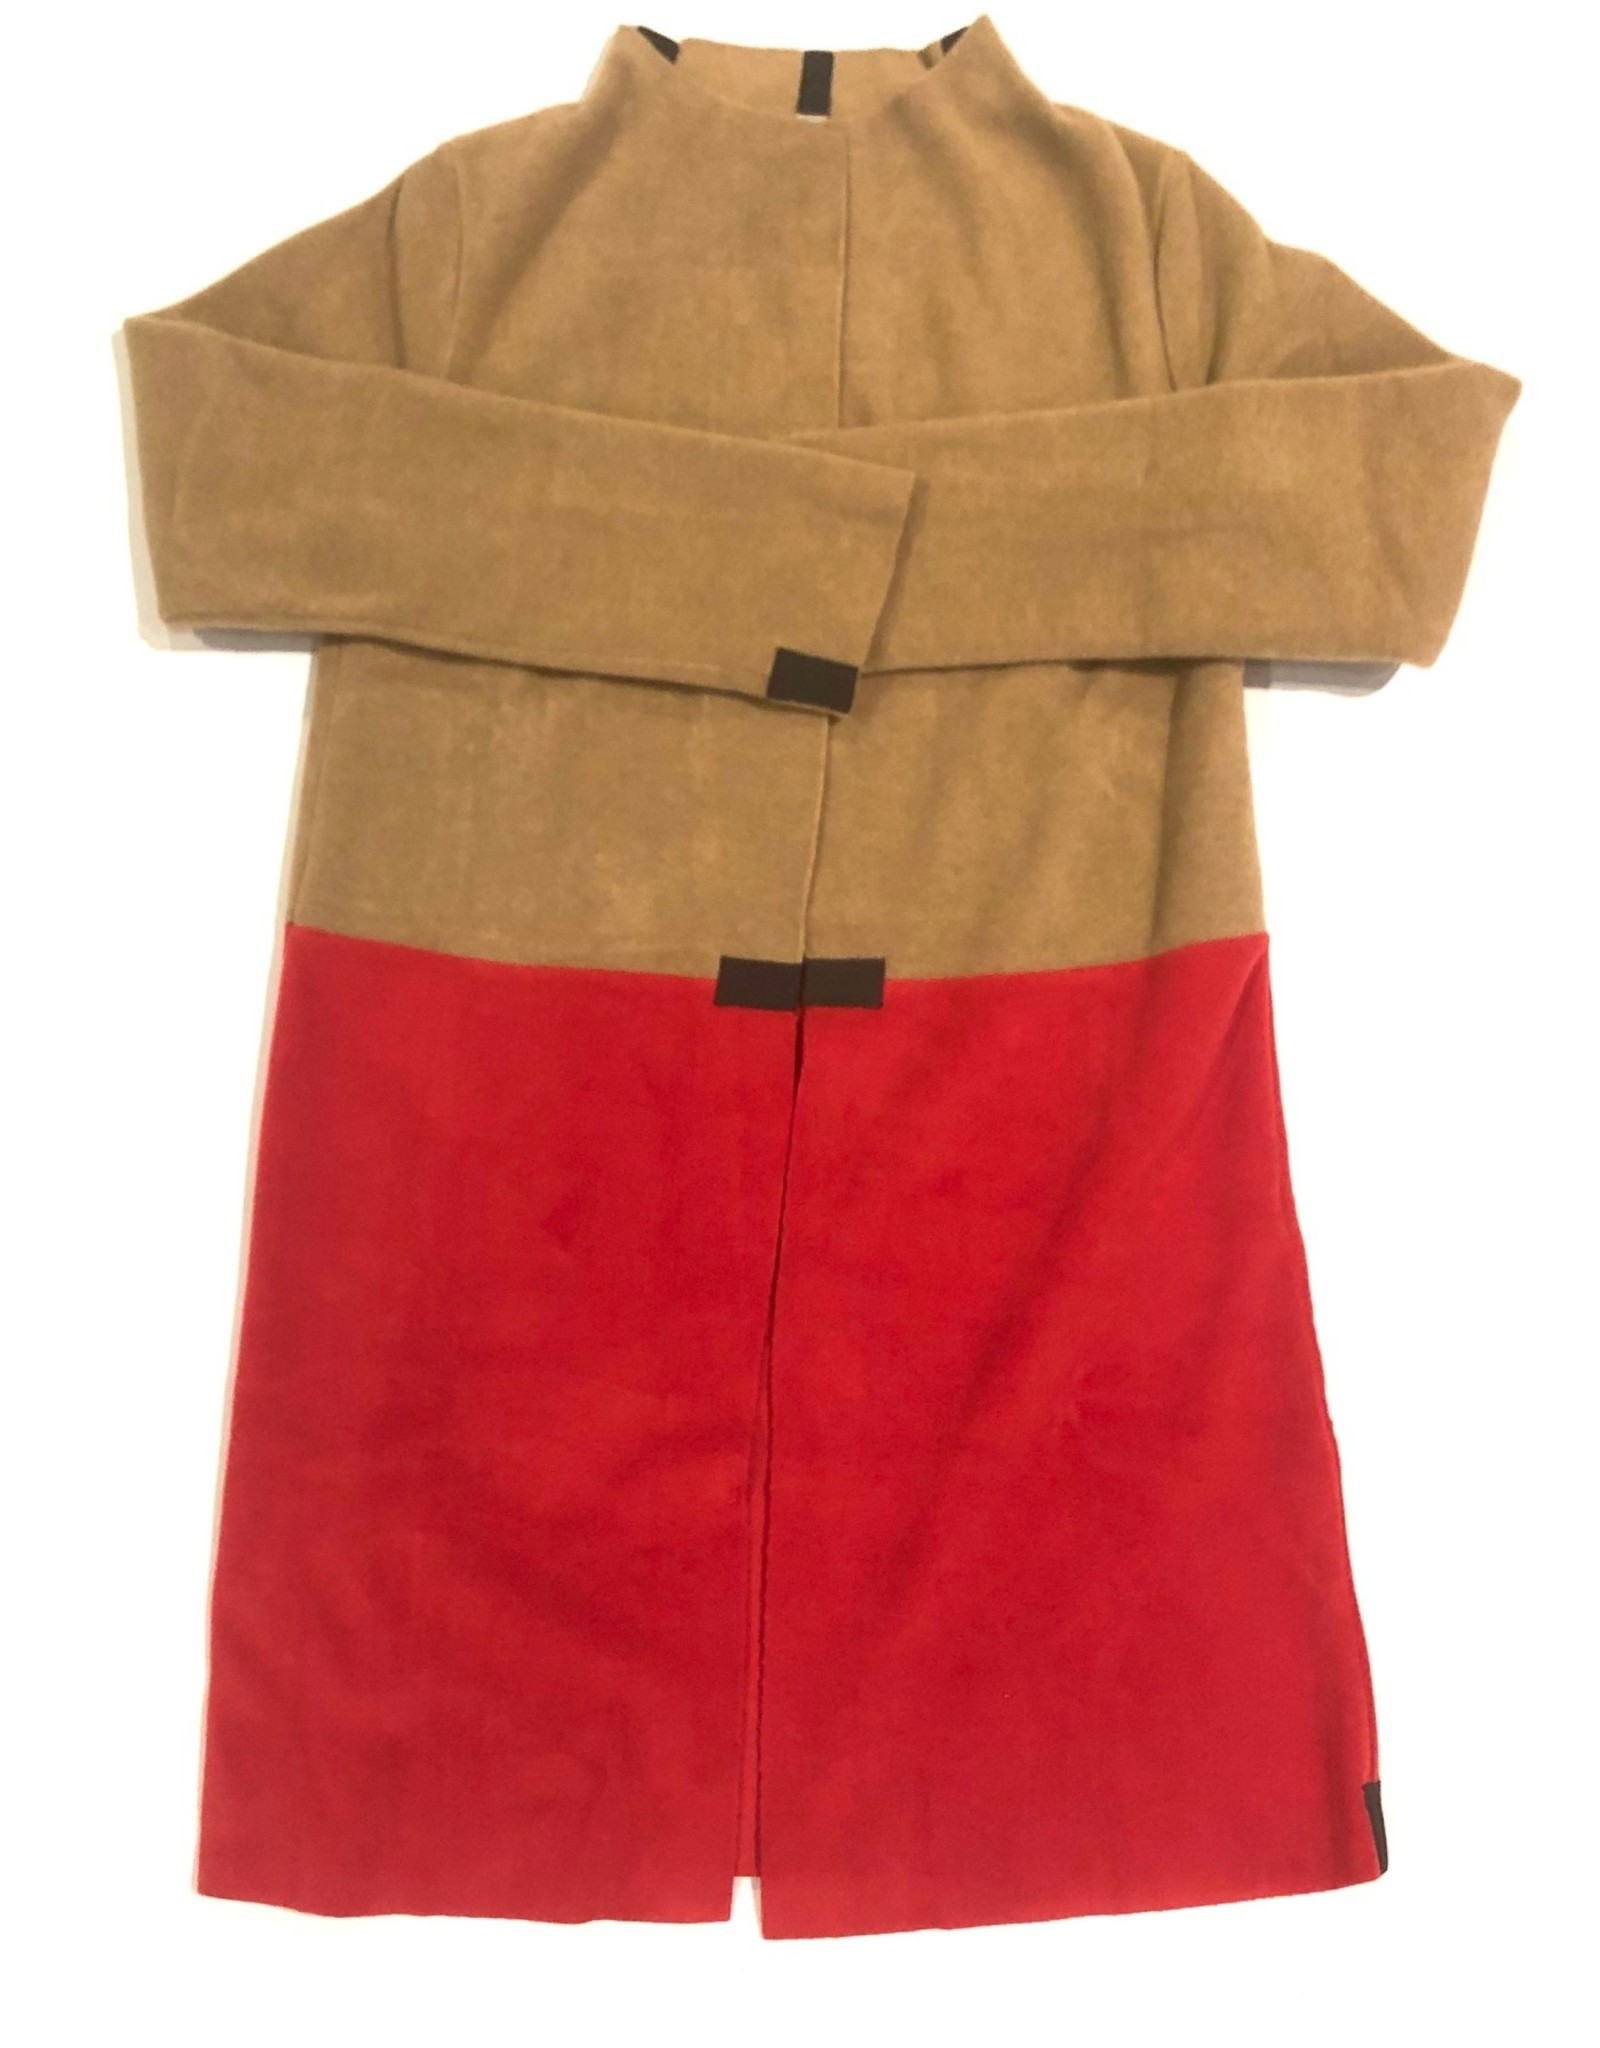 HS fleece cardigan 2 colored